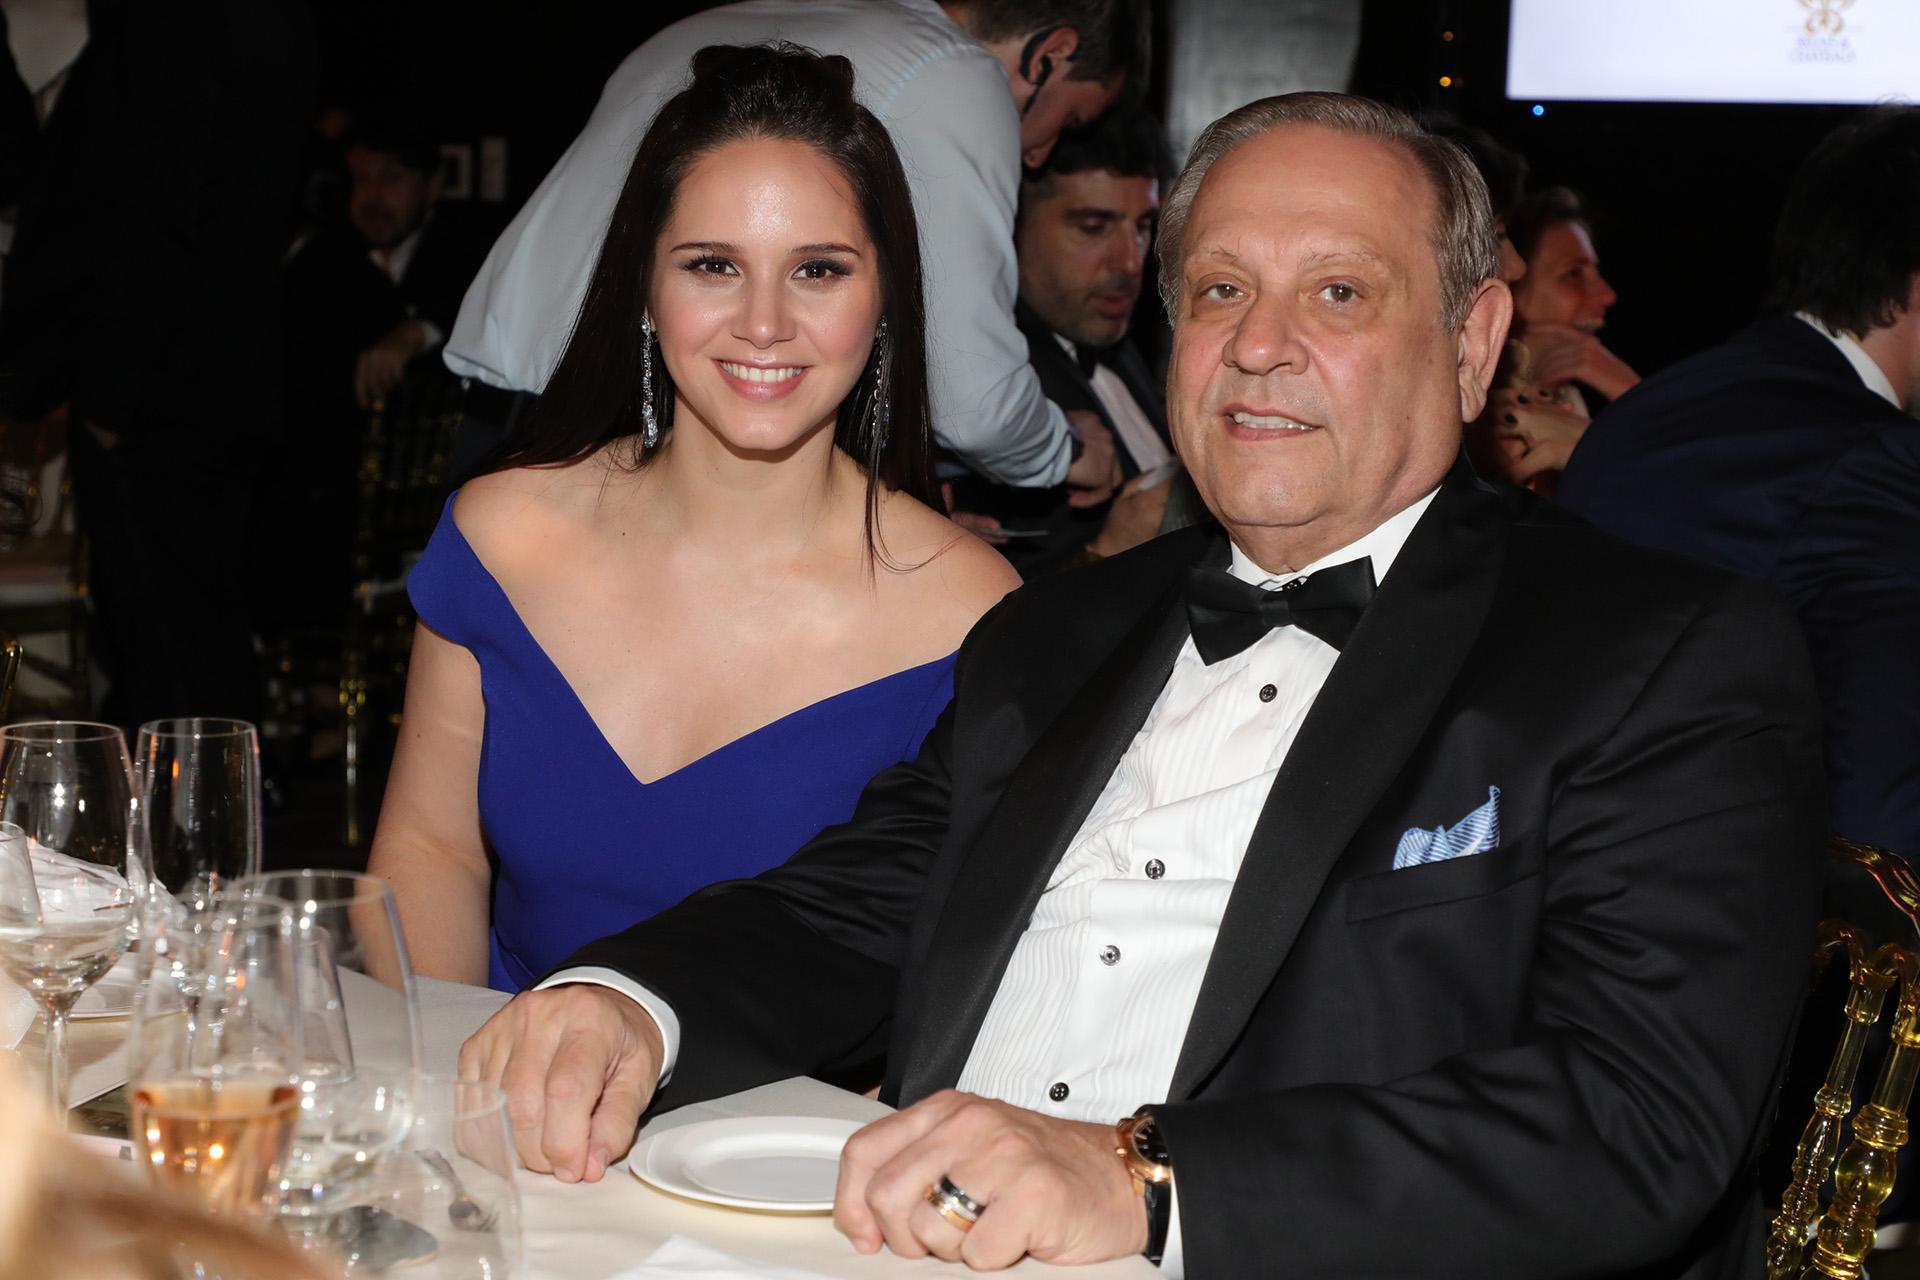 Natalí Márquez y Néstor Abatidaga